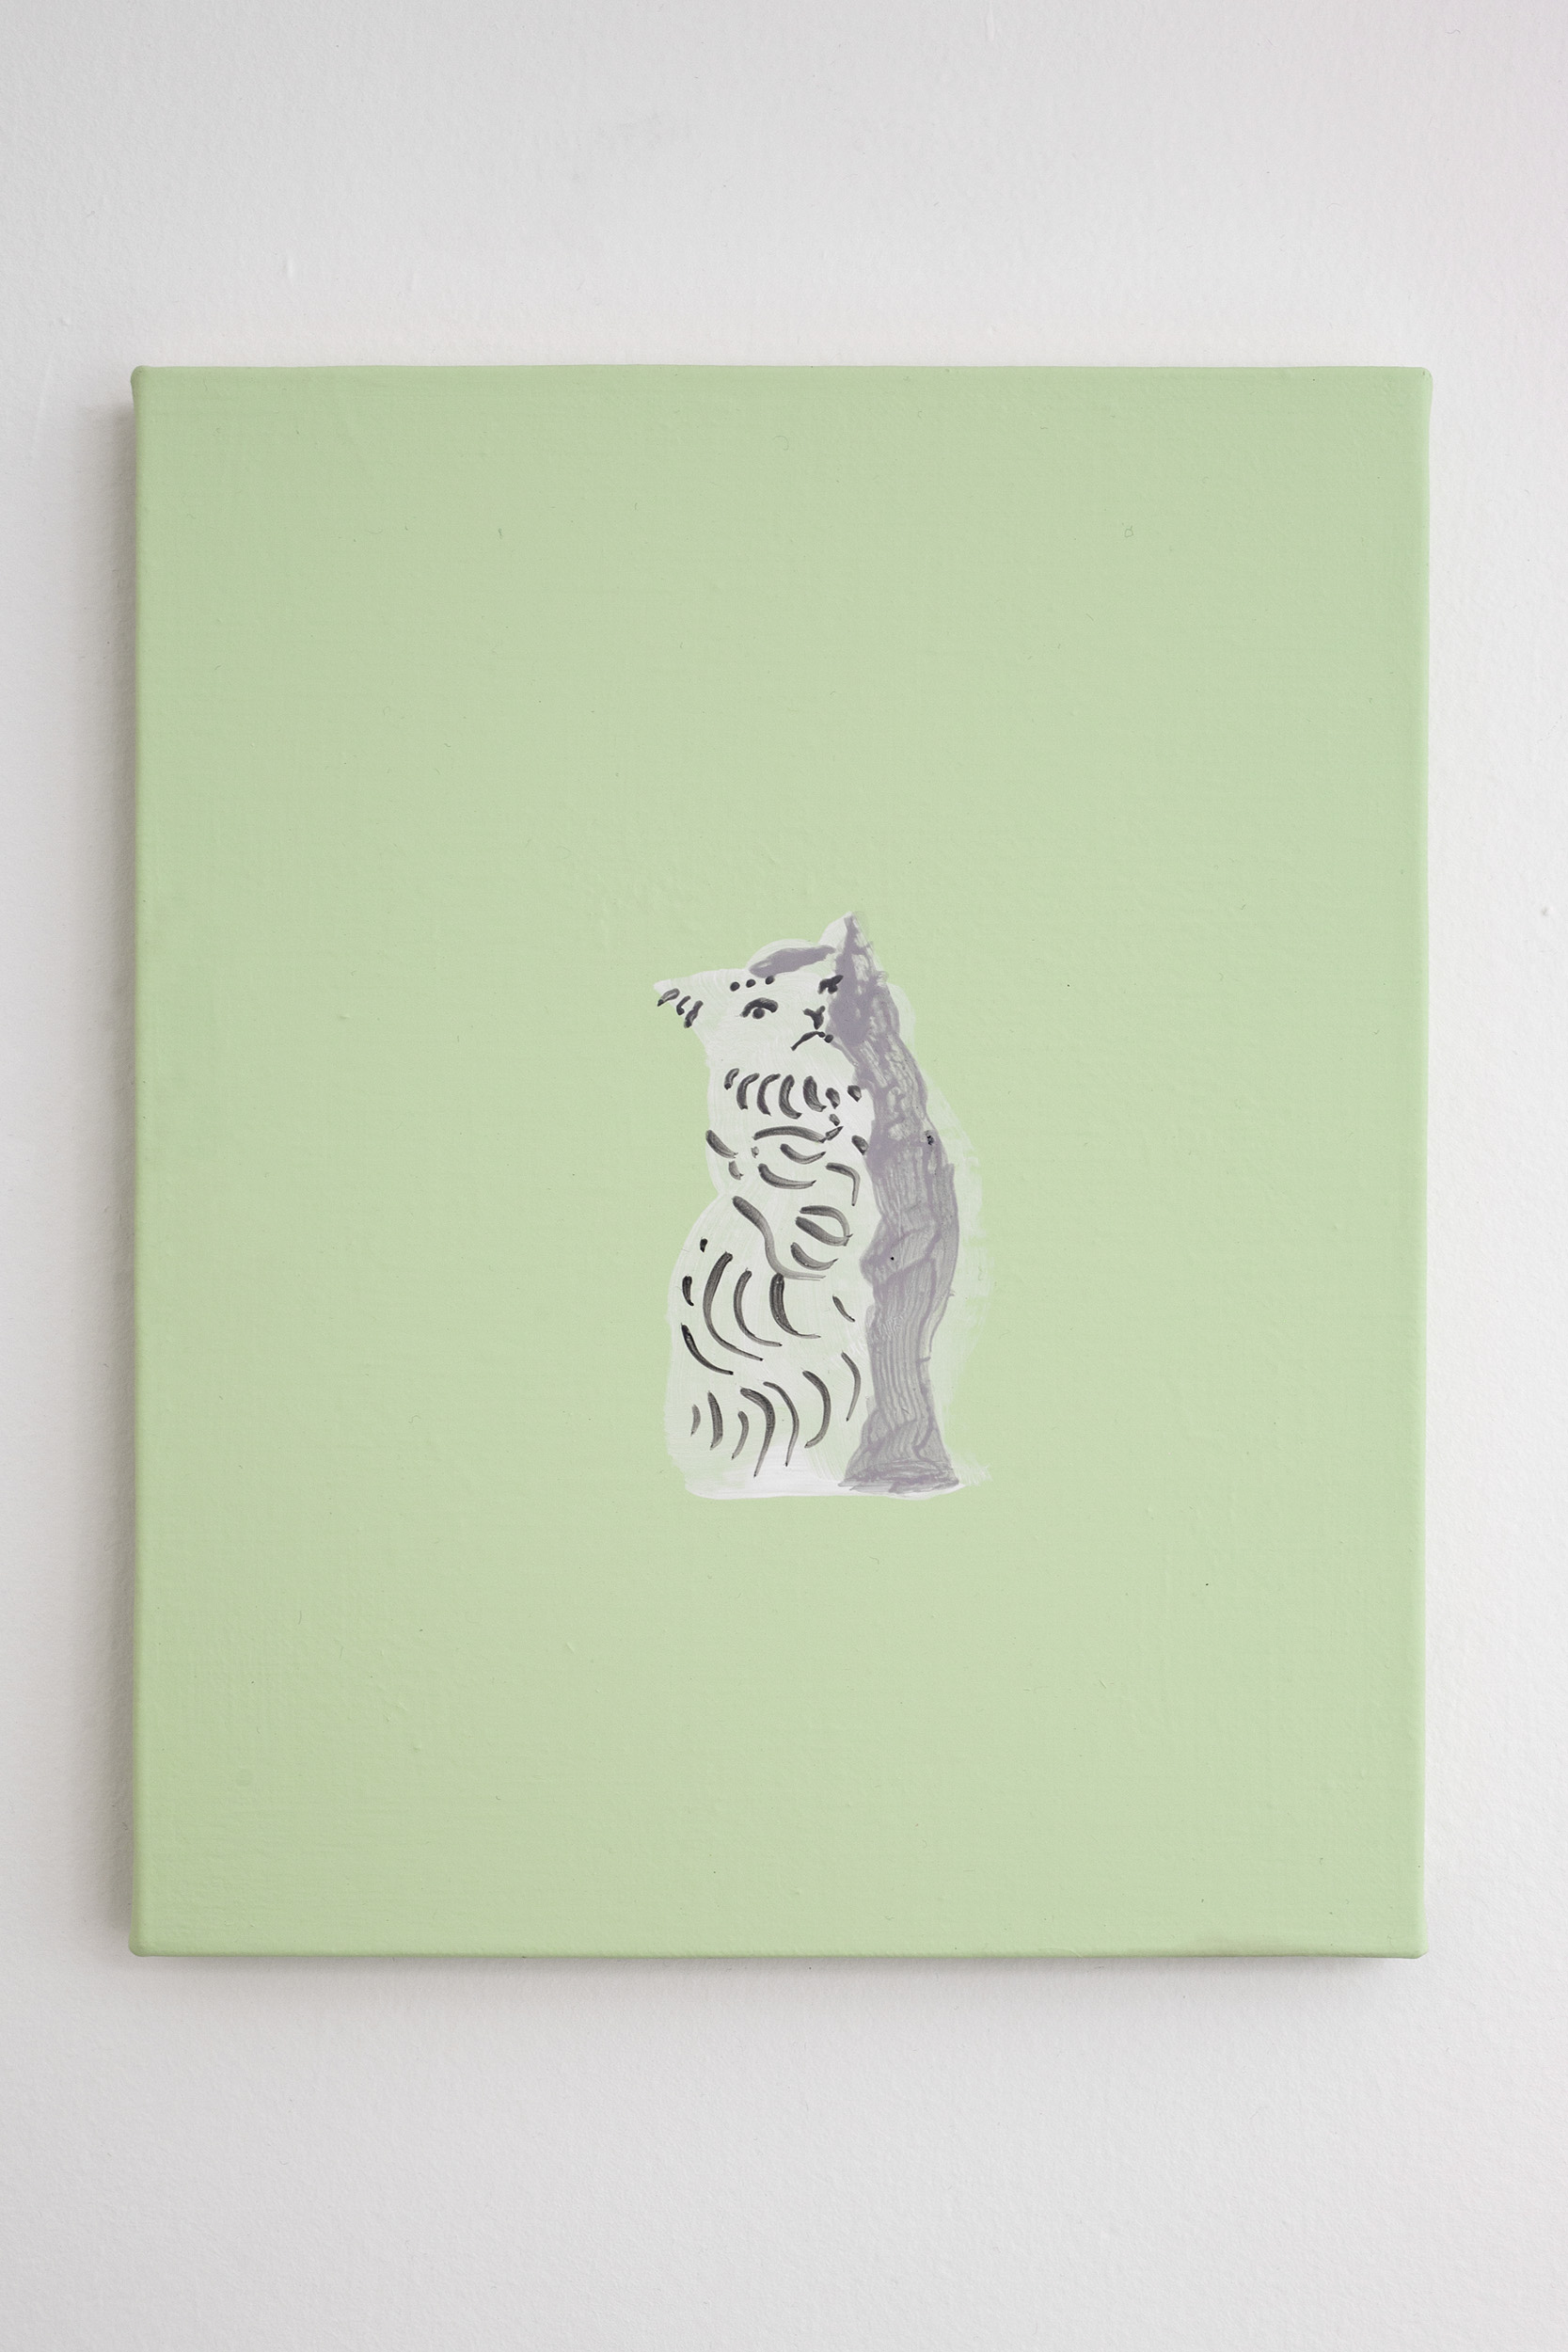 Shimon Minamikawa  (Various) Cat (Figurines),  2019. Acrylic on canvas, 27.5 x 22.2cm